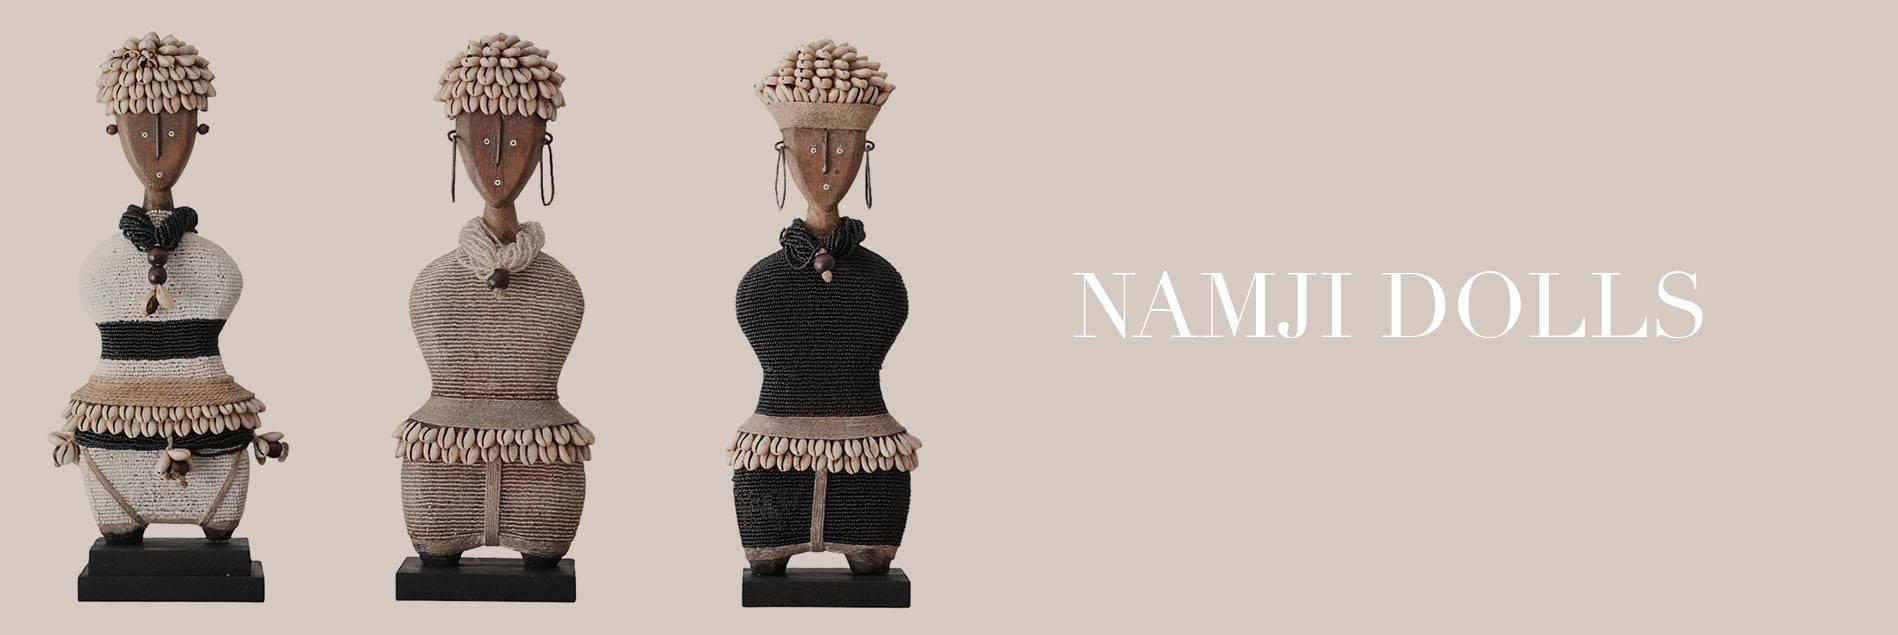 Namji Dolls - Bamileke Stools, Tonga Stools, Zebra Pillows and Binga Baskets